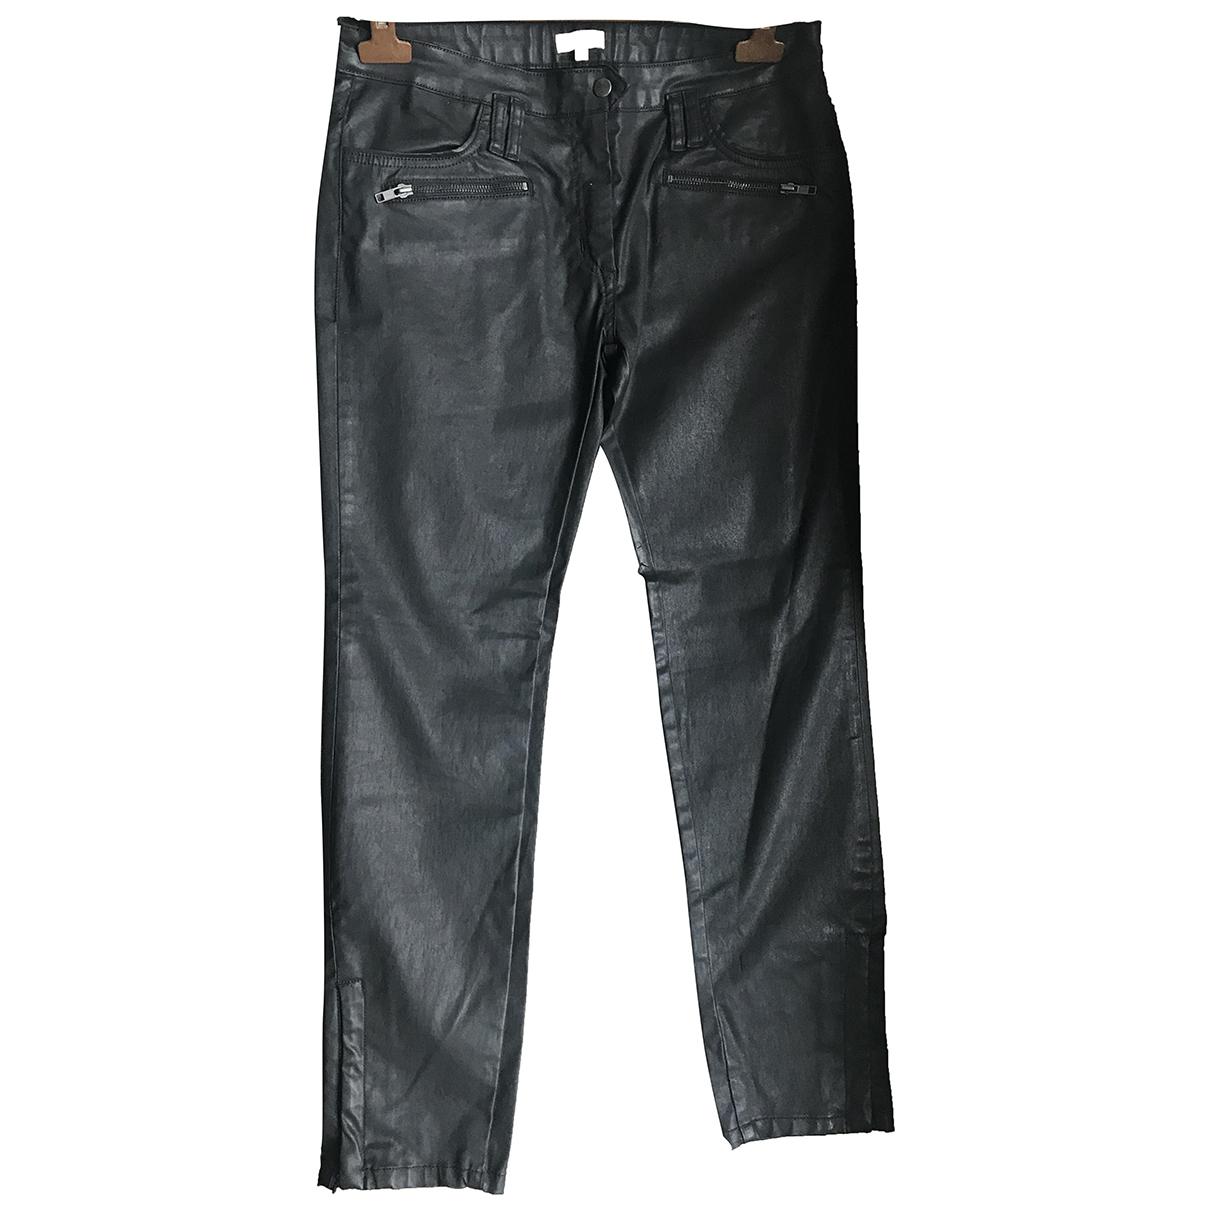 Claudie Pierlot \N Black Cotton - elasthane Jeans for Women 40 FR